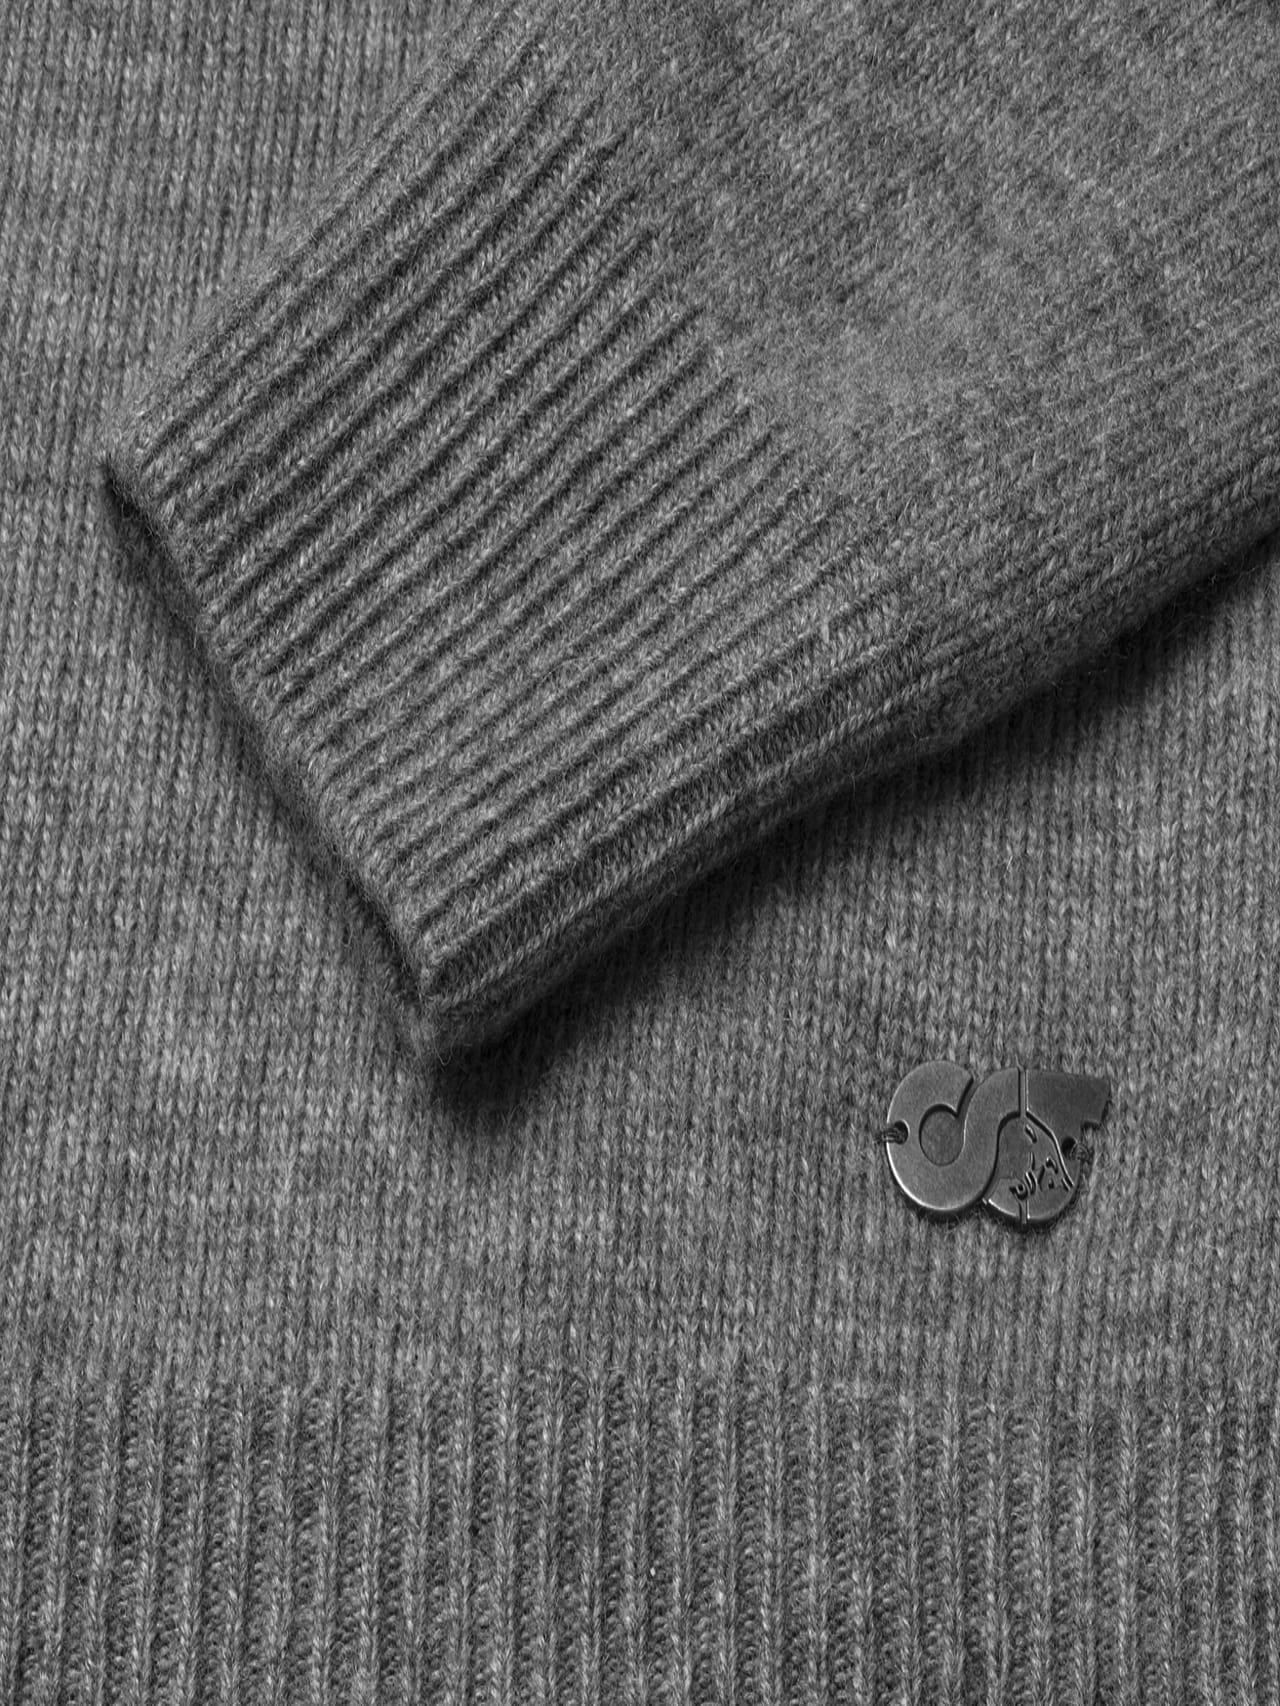 FLACK V2.Y4.02 Nahtloser 3D Knit Merino-Kaschmir Pullover Grau / Melange scene7.view.8.name Alpha Tauri